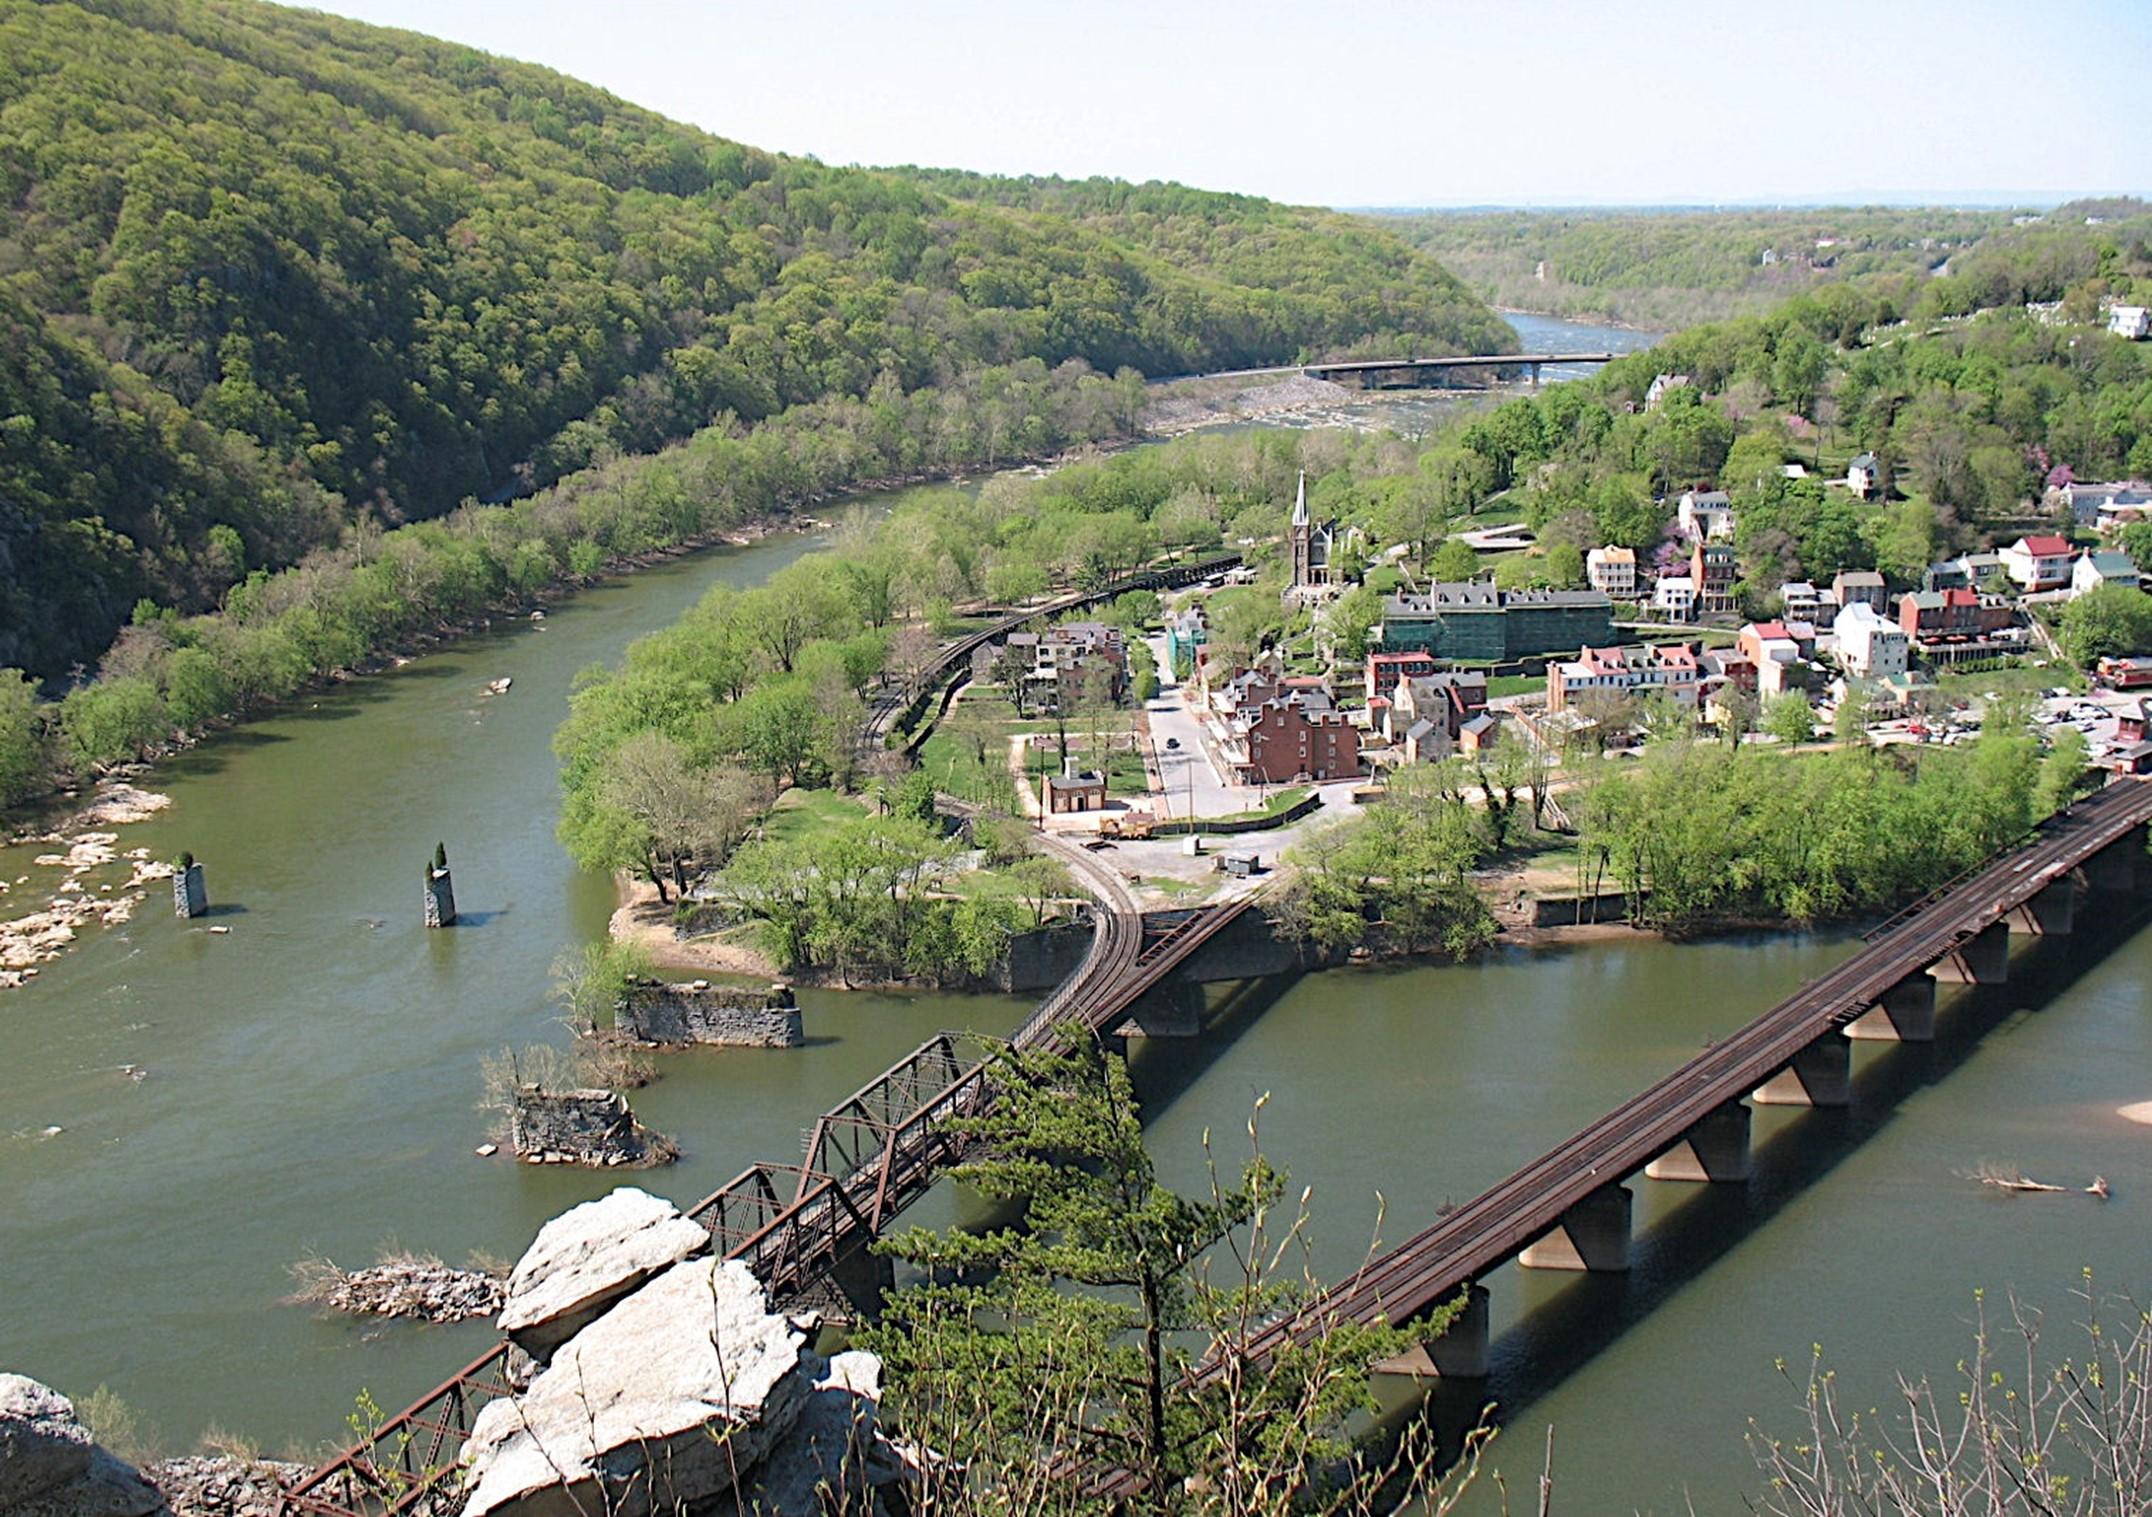 Riverpalooza Harpers Ferry Tubing